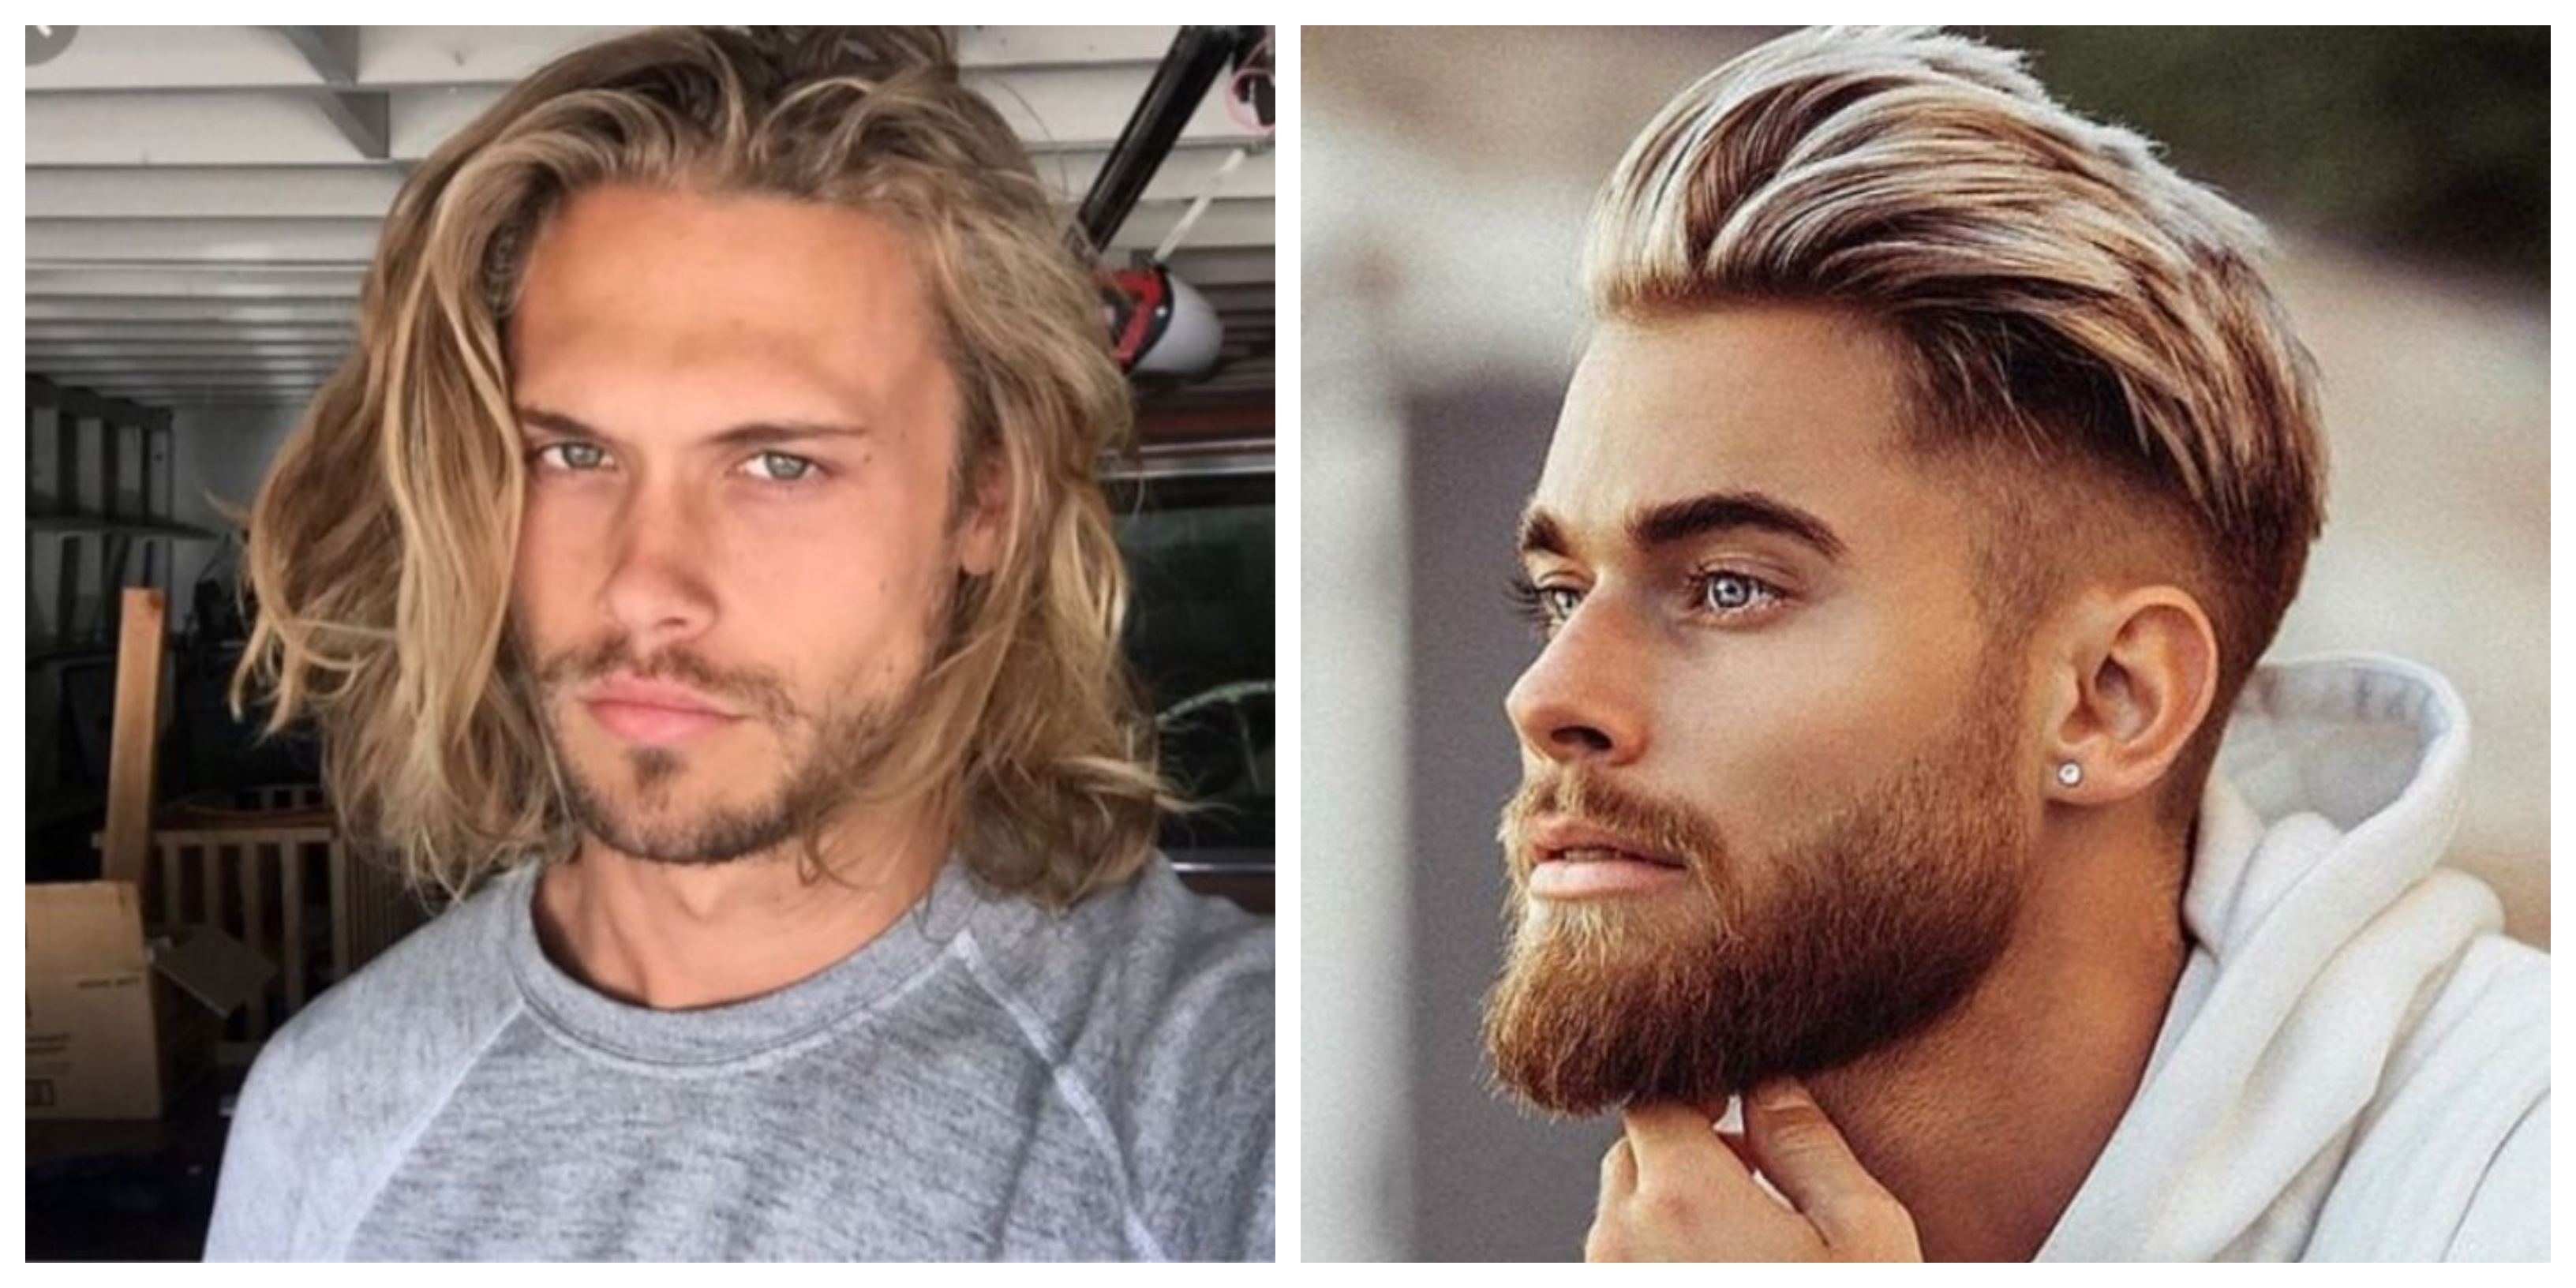 Frisuren Manner Blond Mittellang